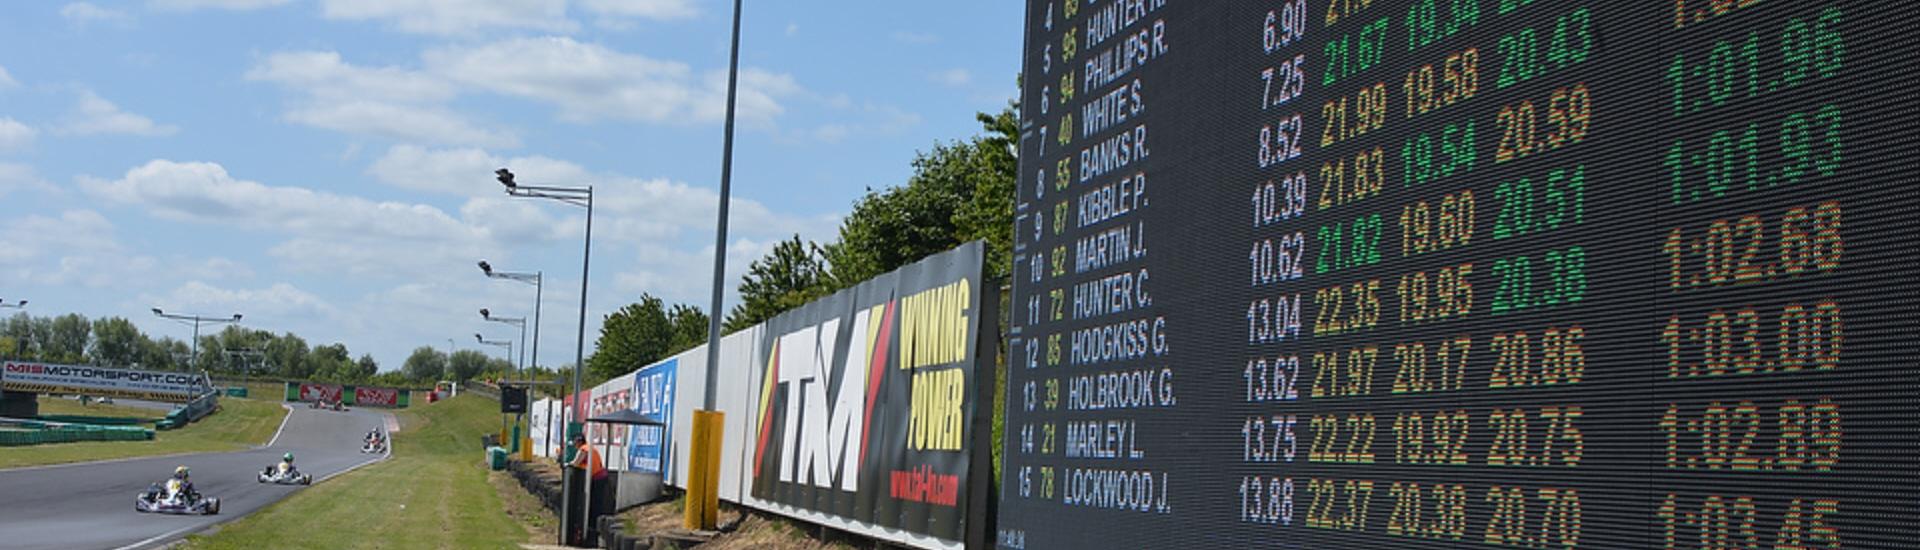 tvkc karting club lincolnshire where to stay